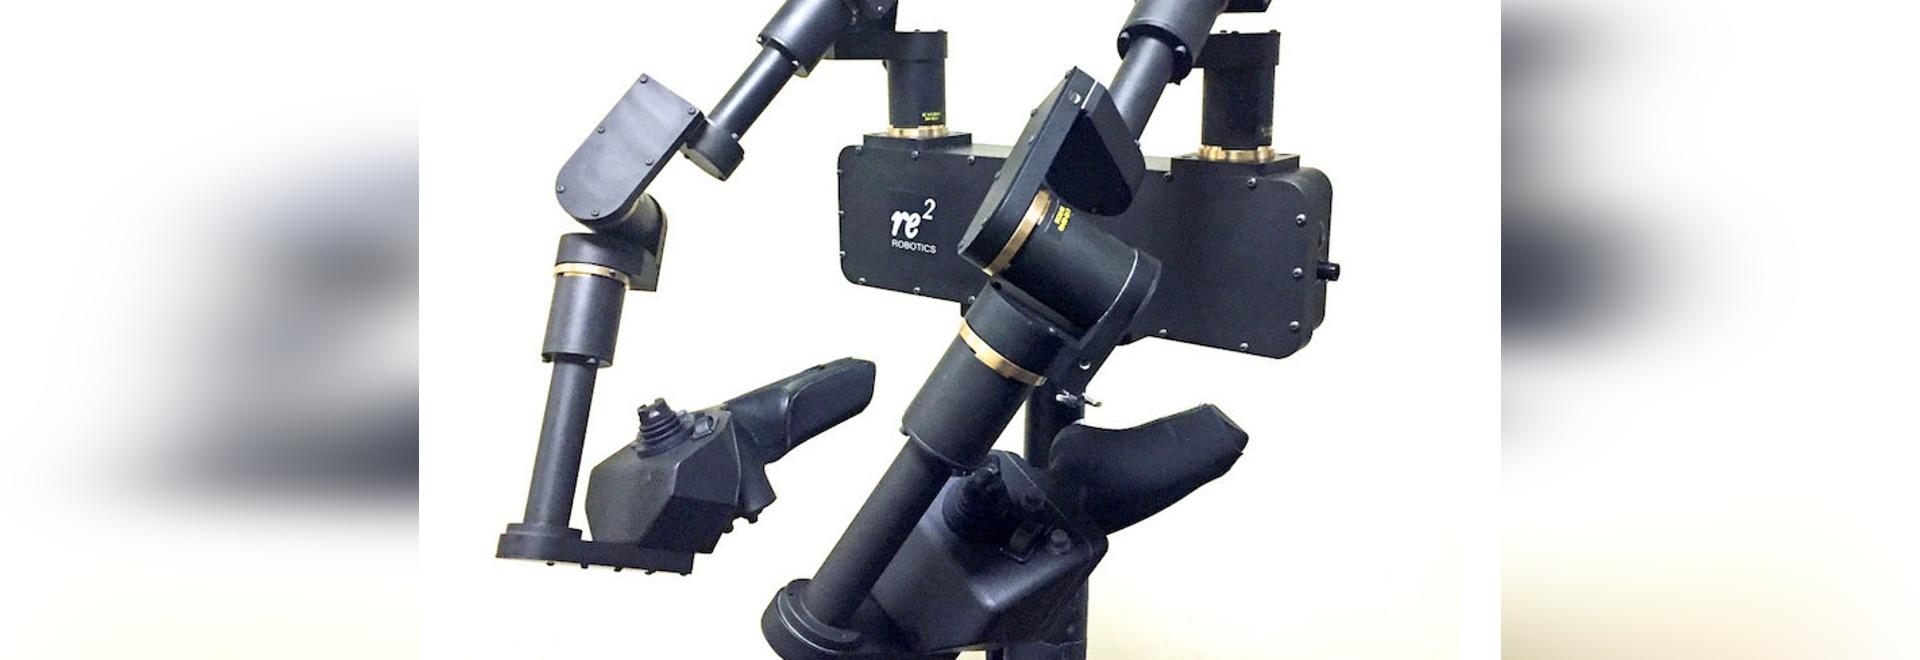 RE2 Robotics se une a PPE Connect PGH para ayudar a fabricar protectores faciales